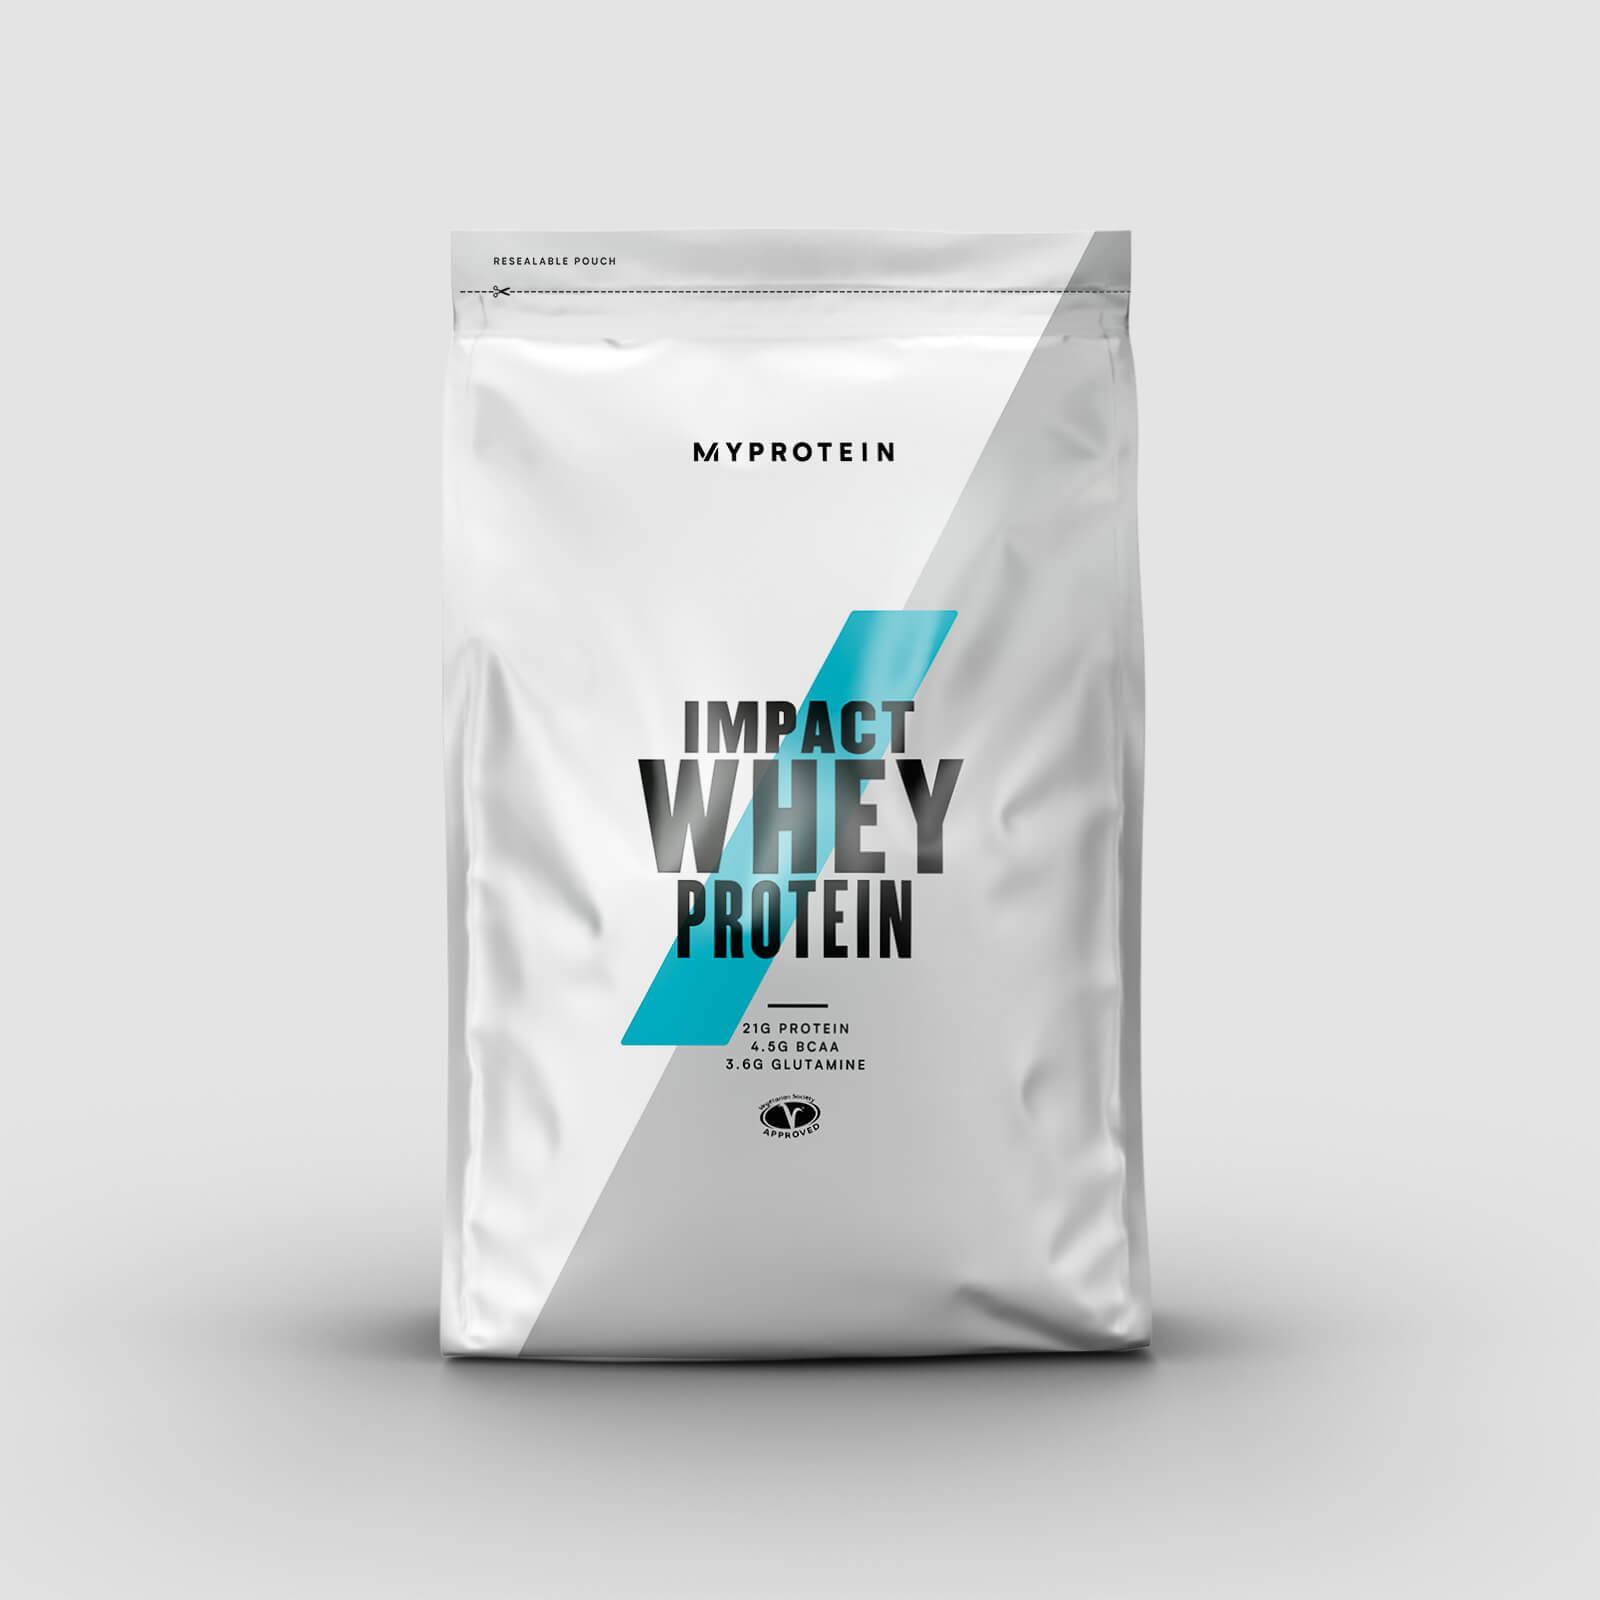 Myprotein Impact Whey Protein - 1kg - Banane